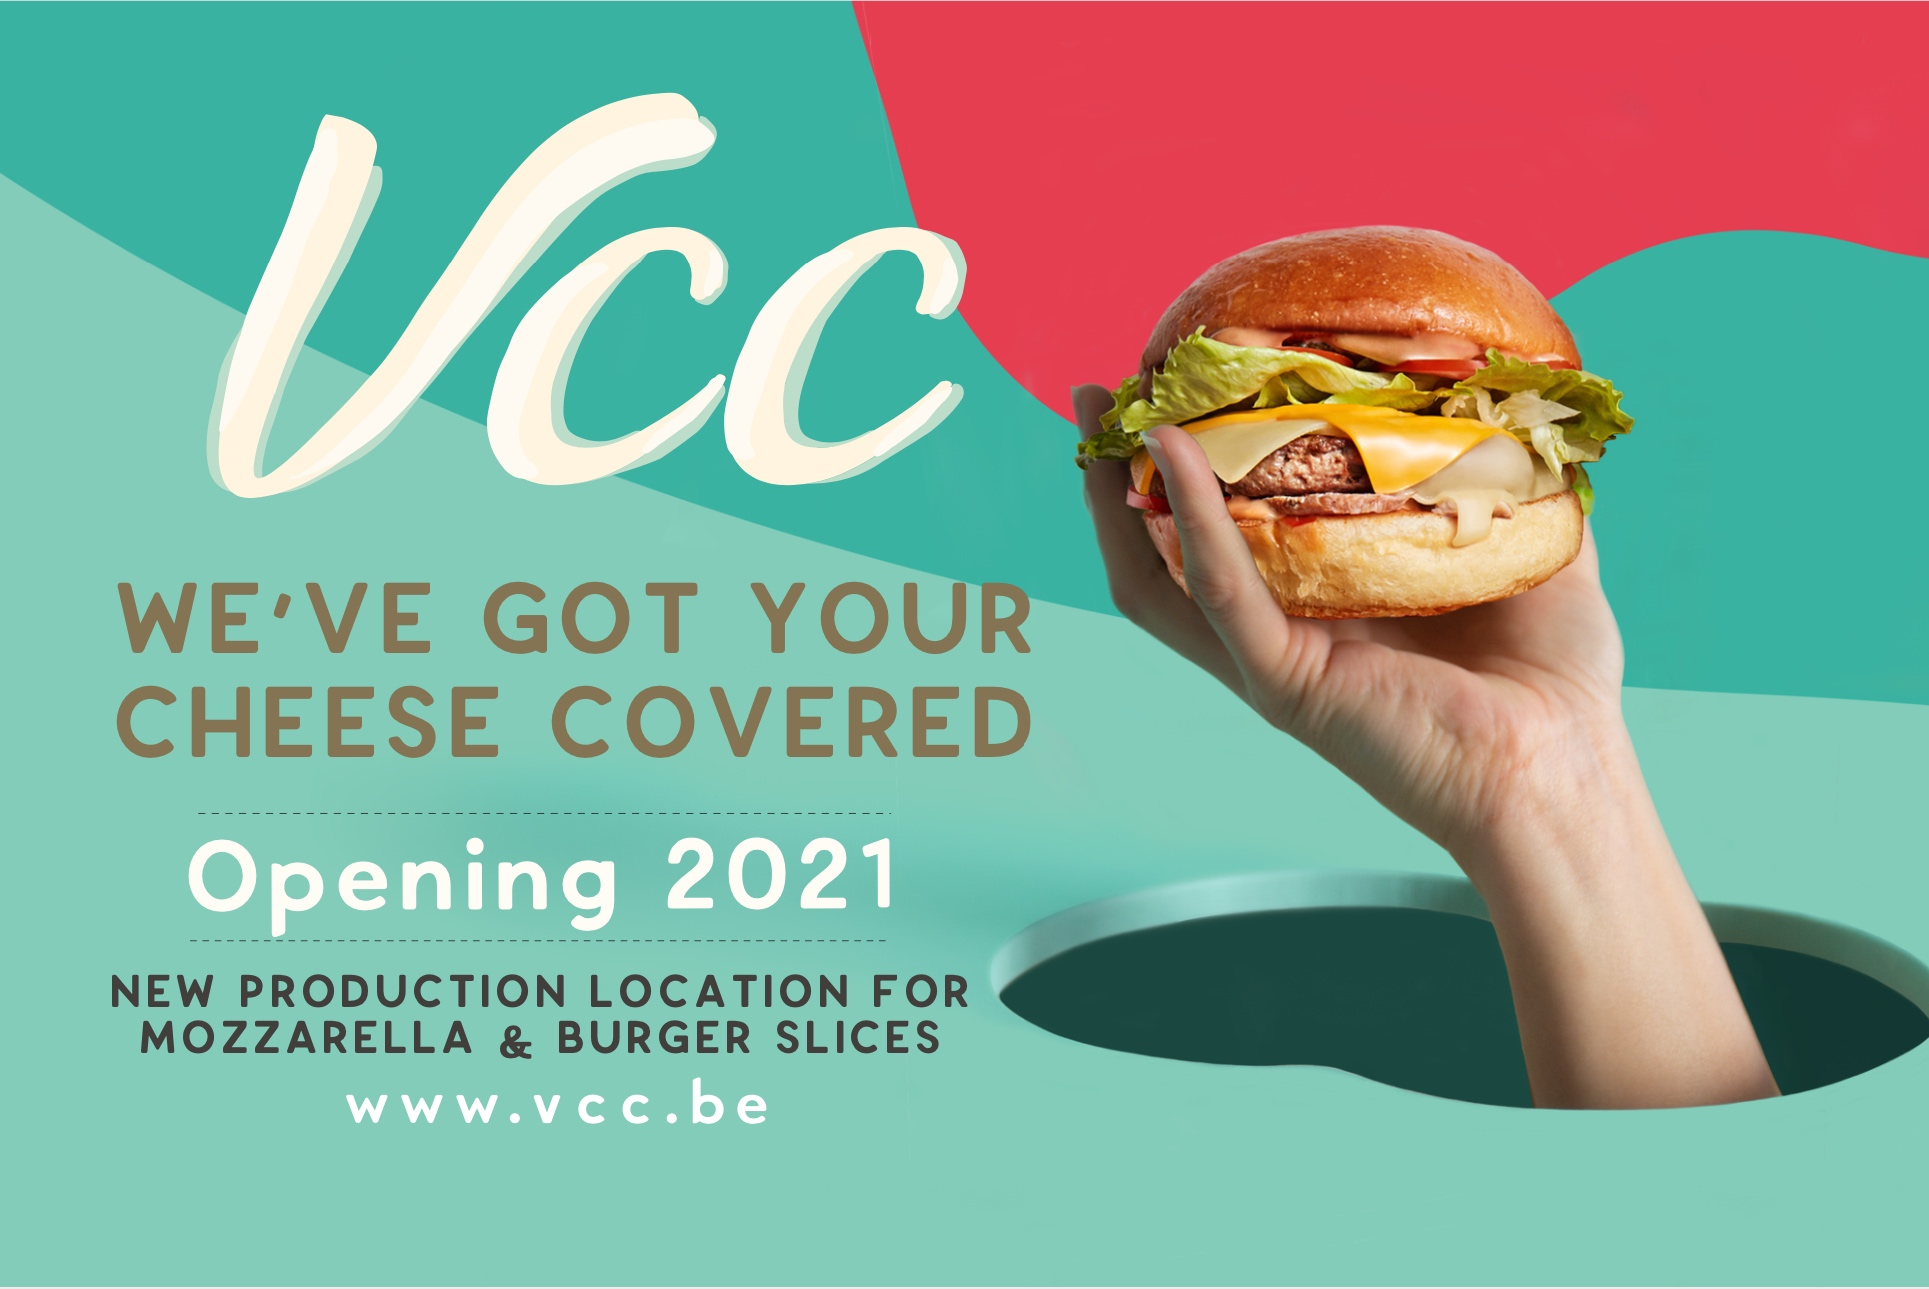 VCC_cheese_factory_belgium